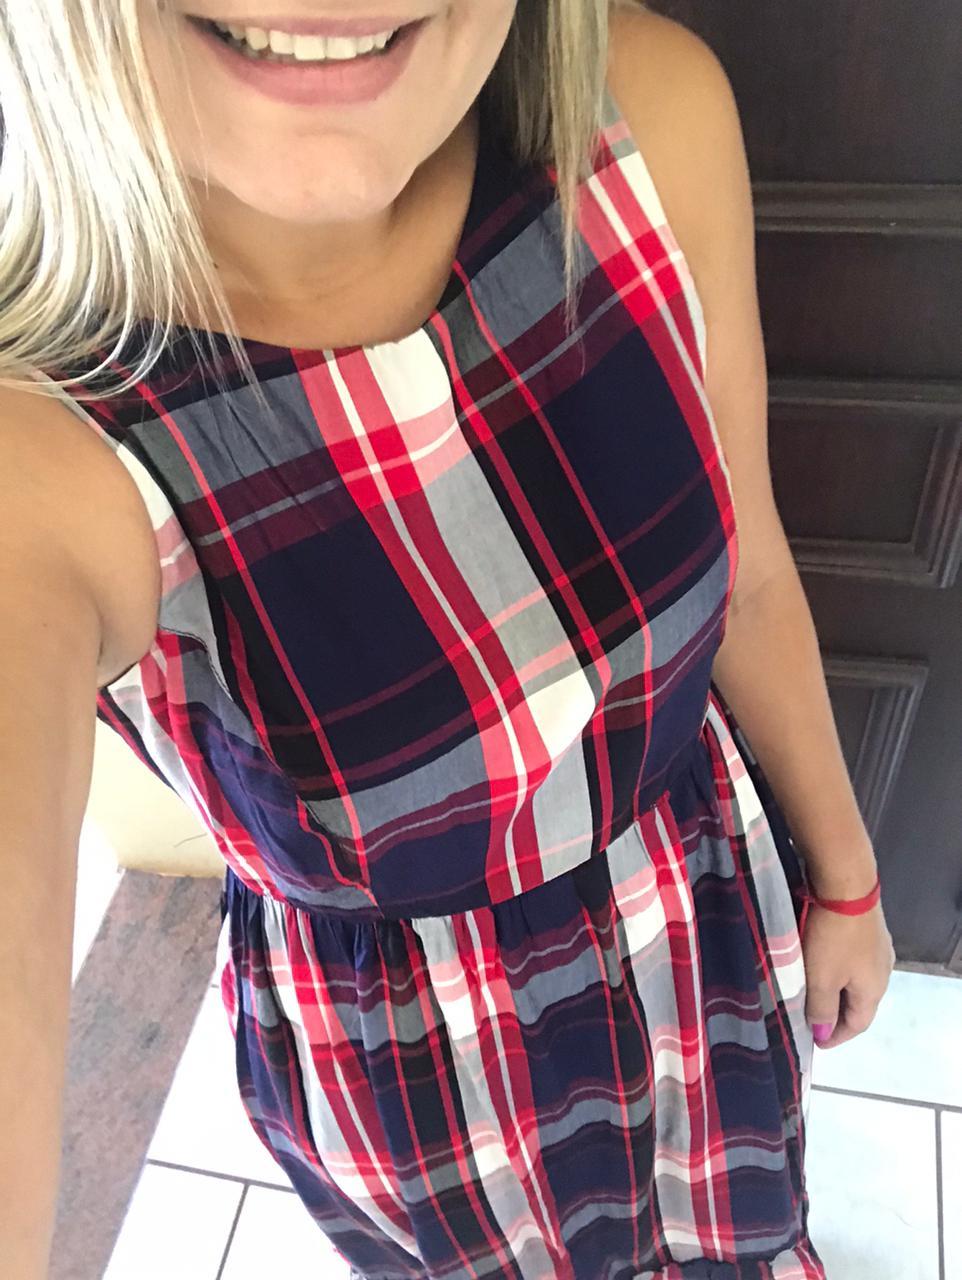 Vestido Regata Midi com Estampa Xadrez de Vermelho e Azul